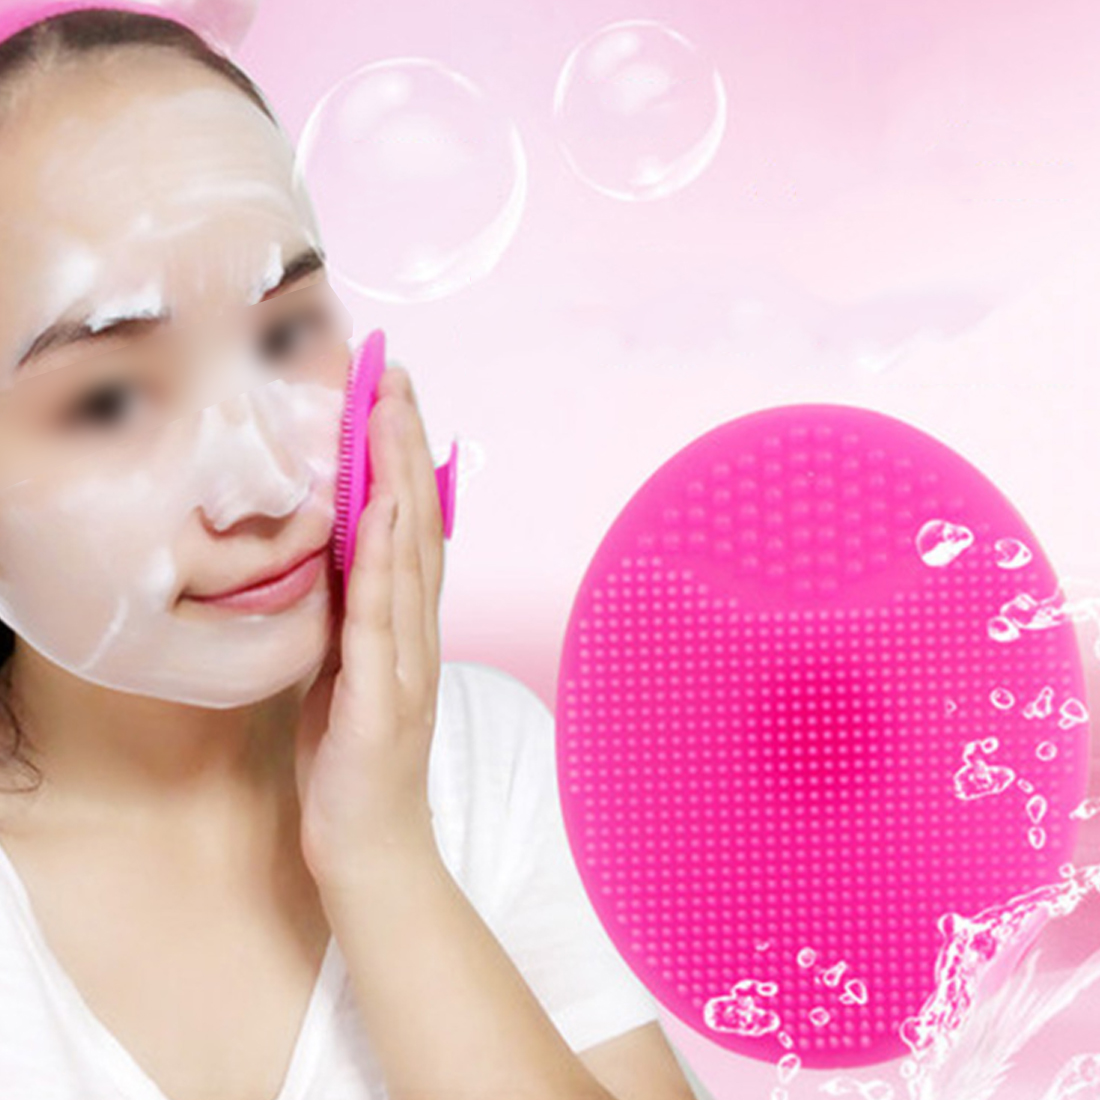 Hot Sale 1 PC Silicone Gel Egg Shaped Washing Face Cleaning Pad Facial Exfoliating Brush SPA Skin Scrub Bath Tool Random Color